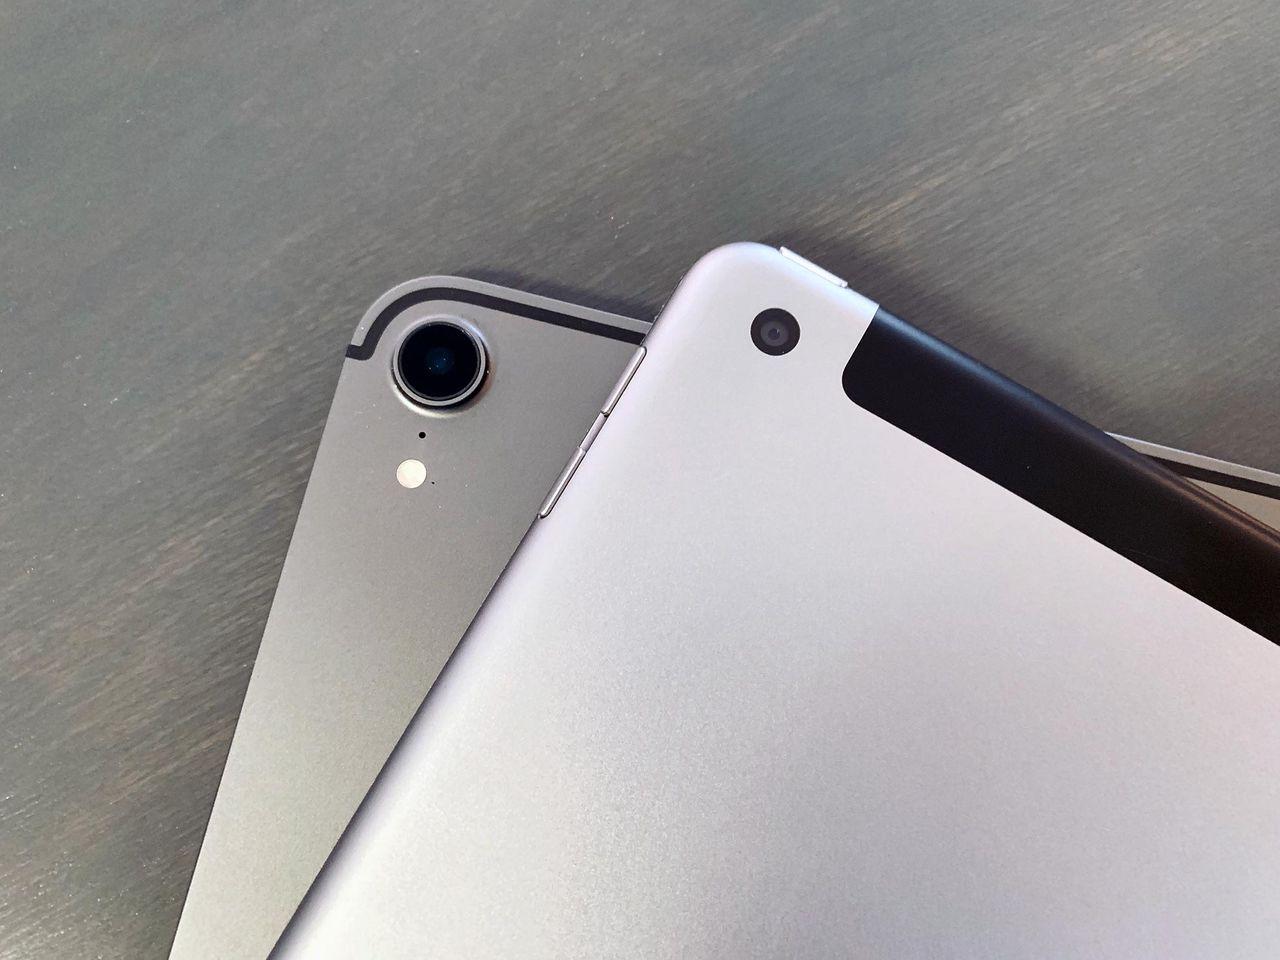 2020 års iPhone får 3D-laser-kamera